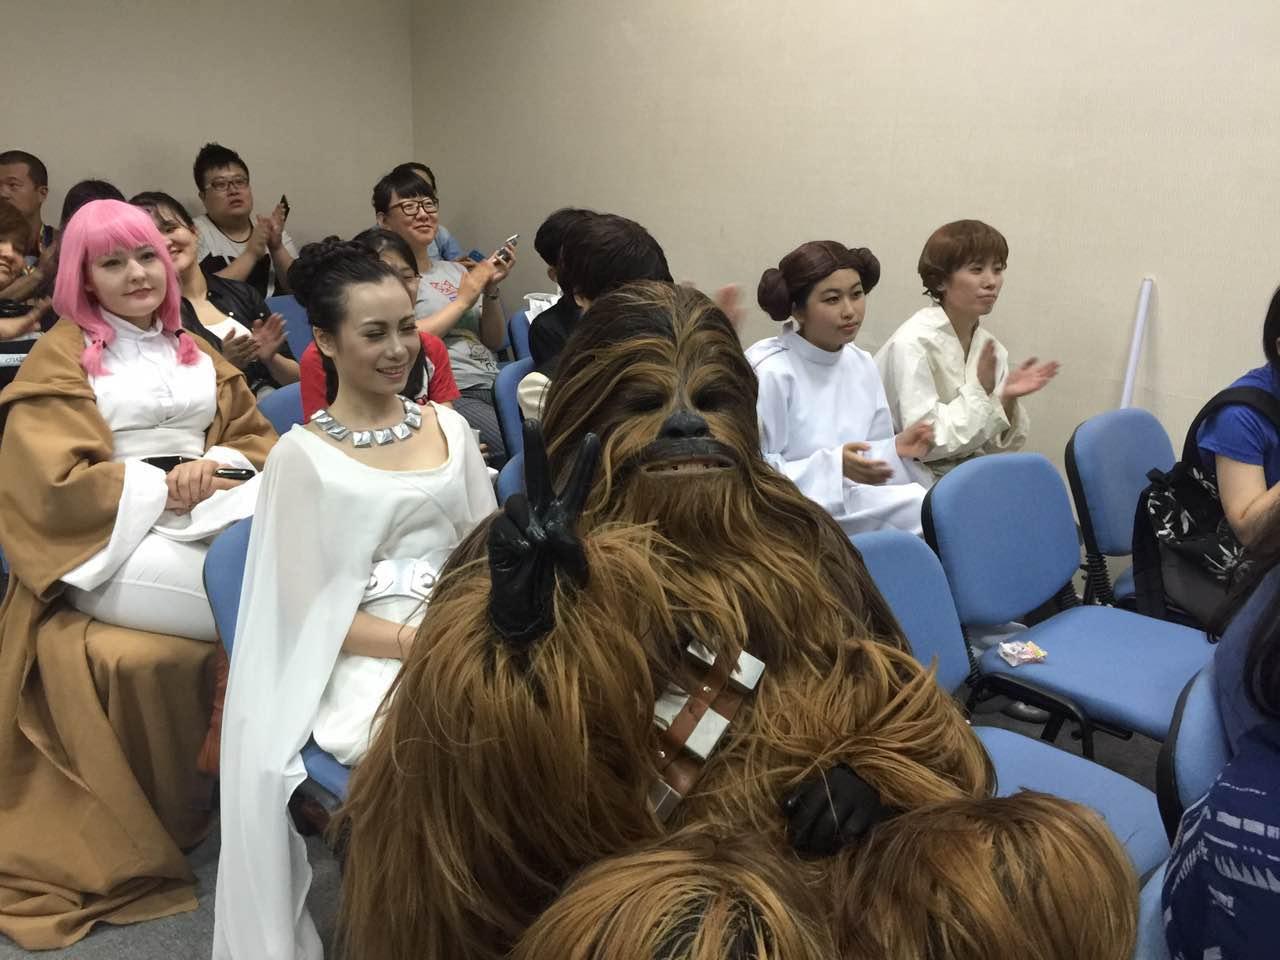 Beijing ComicCon: Chewbacca